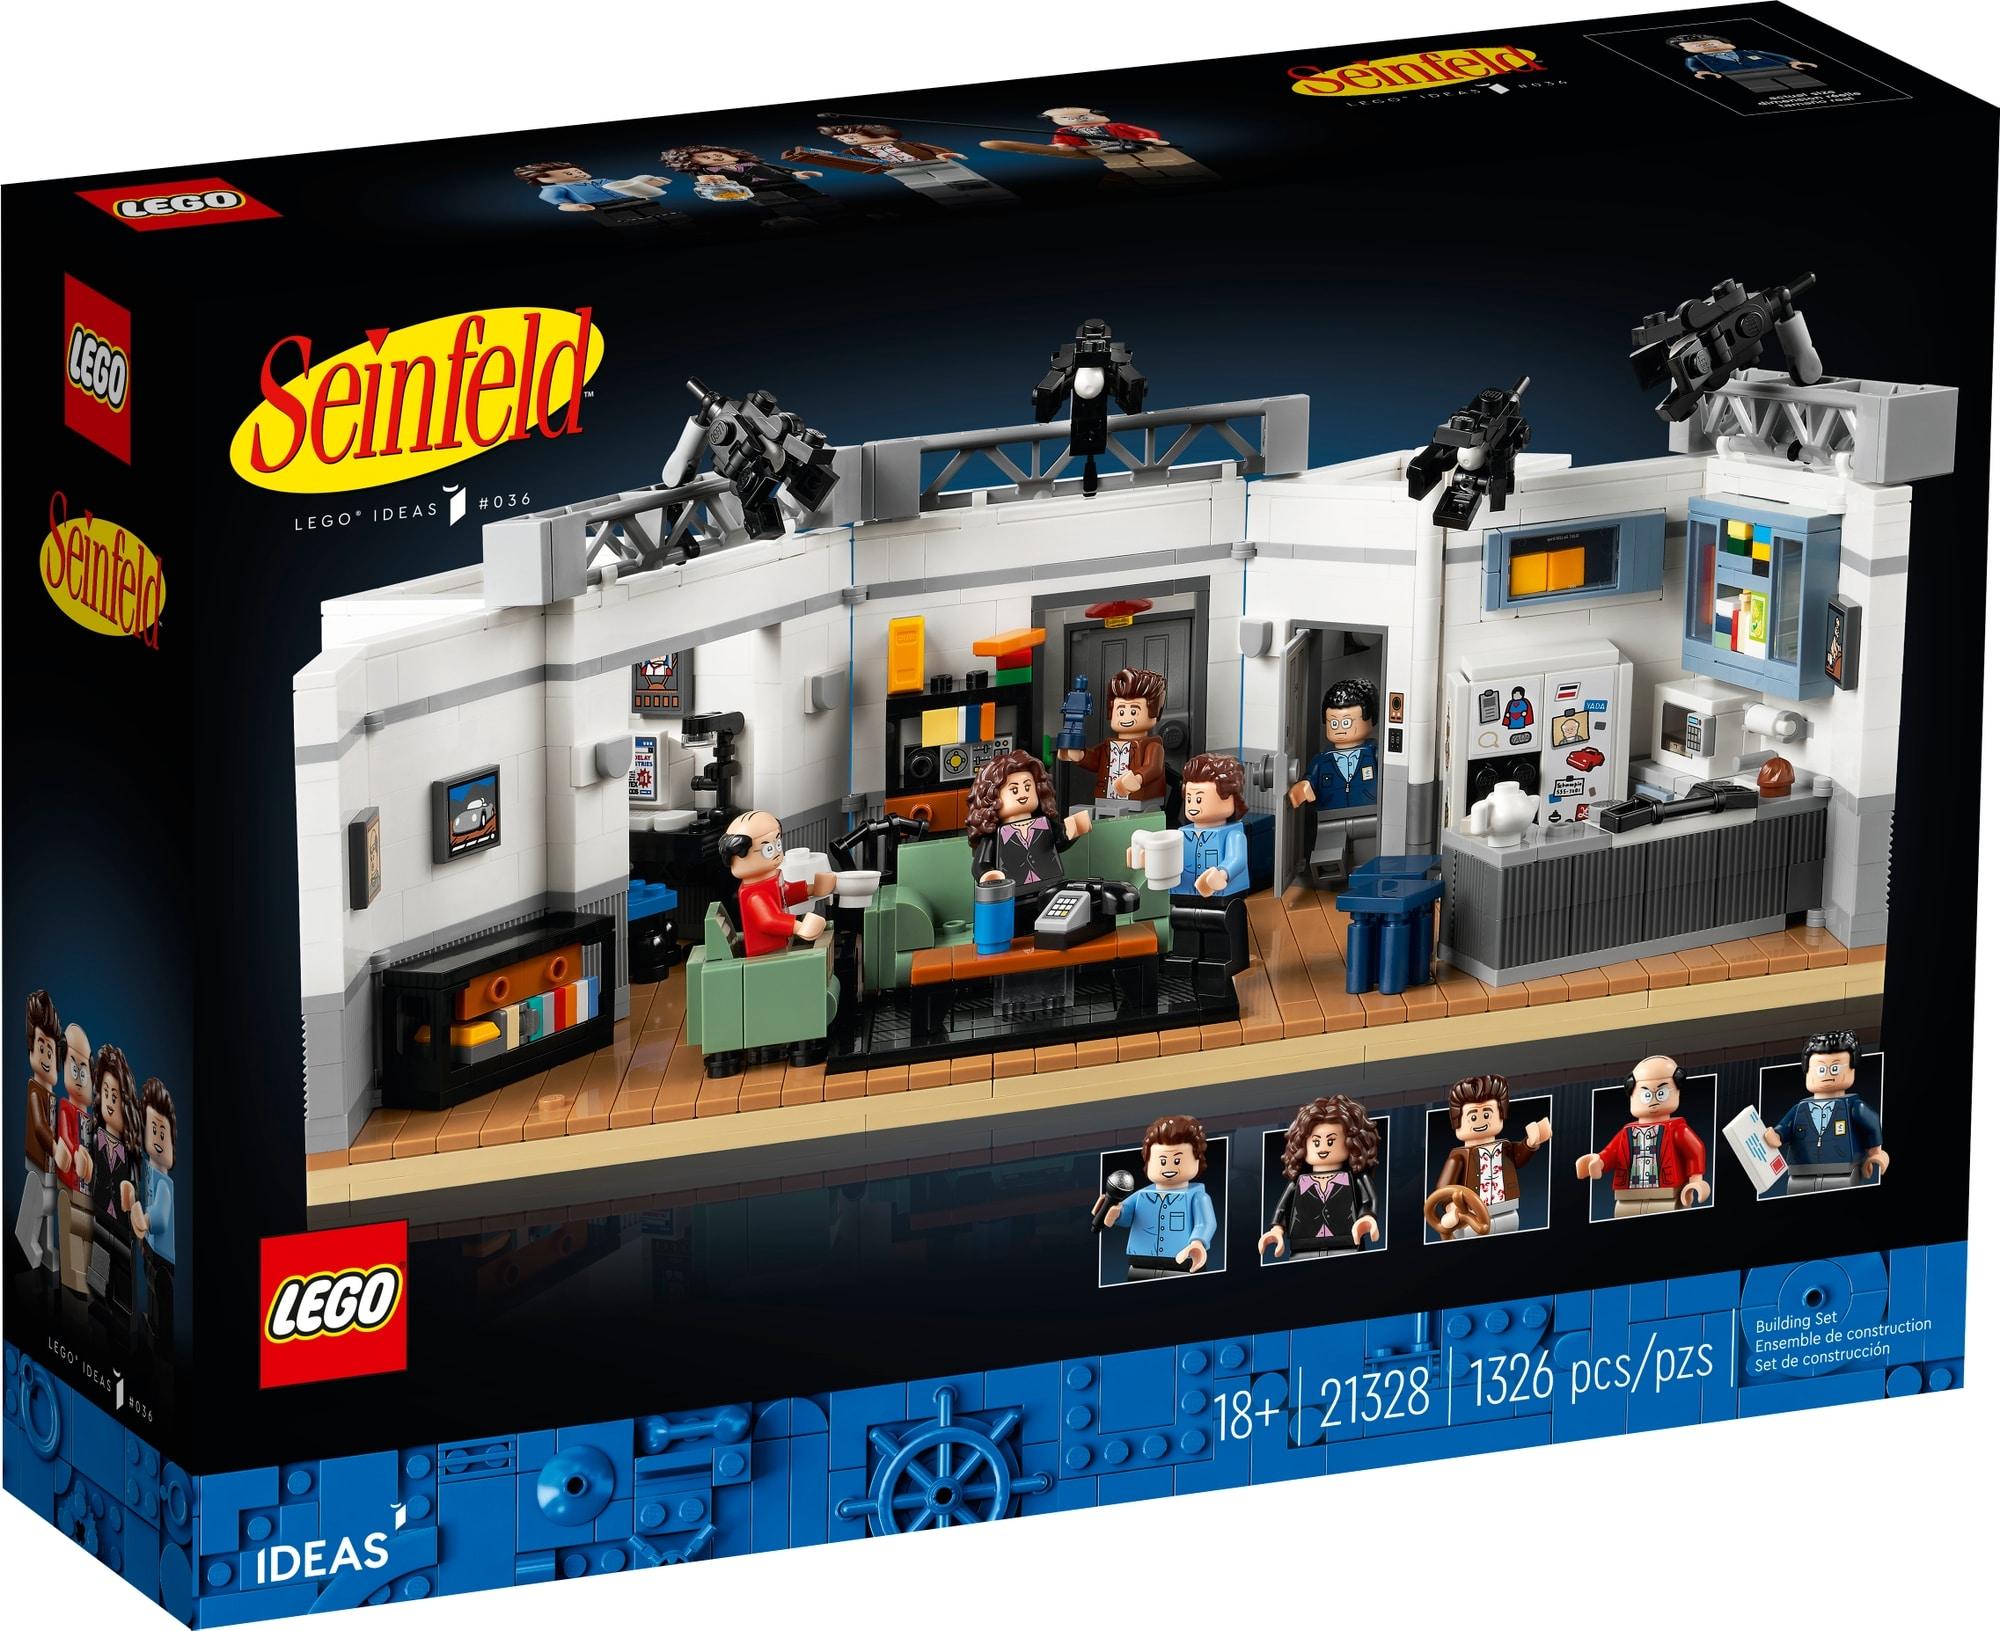 LEGO Ideas 21328 Seinfeld 2